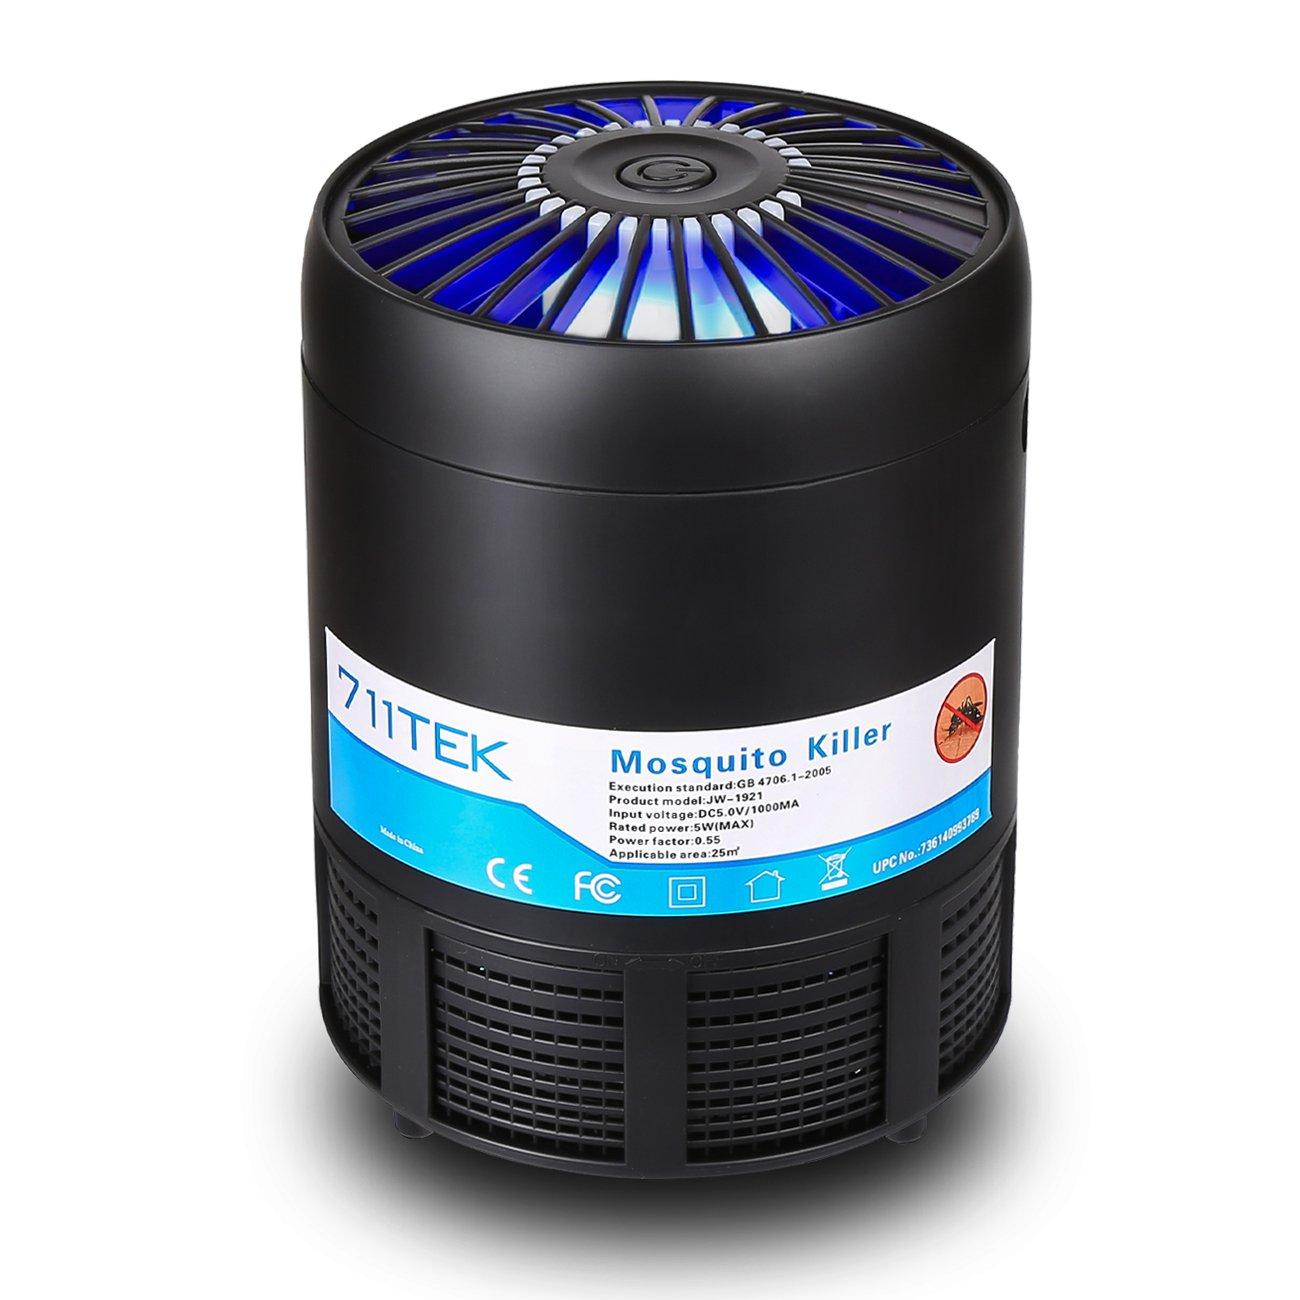 Amazon.com : 711TEK Mosquito Killer, USB Powered Non-toxic UV LED ... for Mosquito Killer Device  83fiz